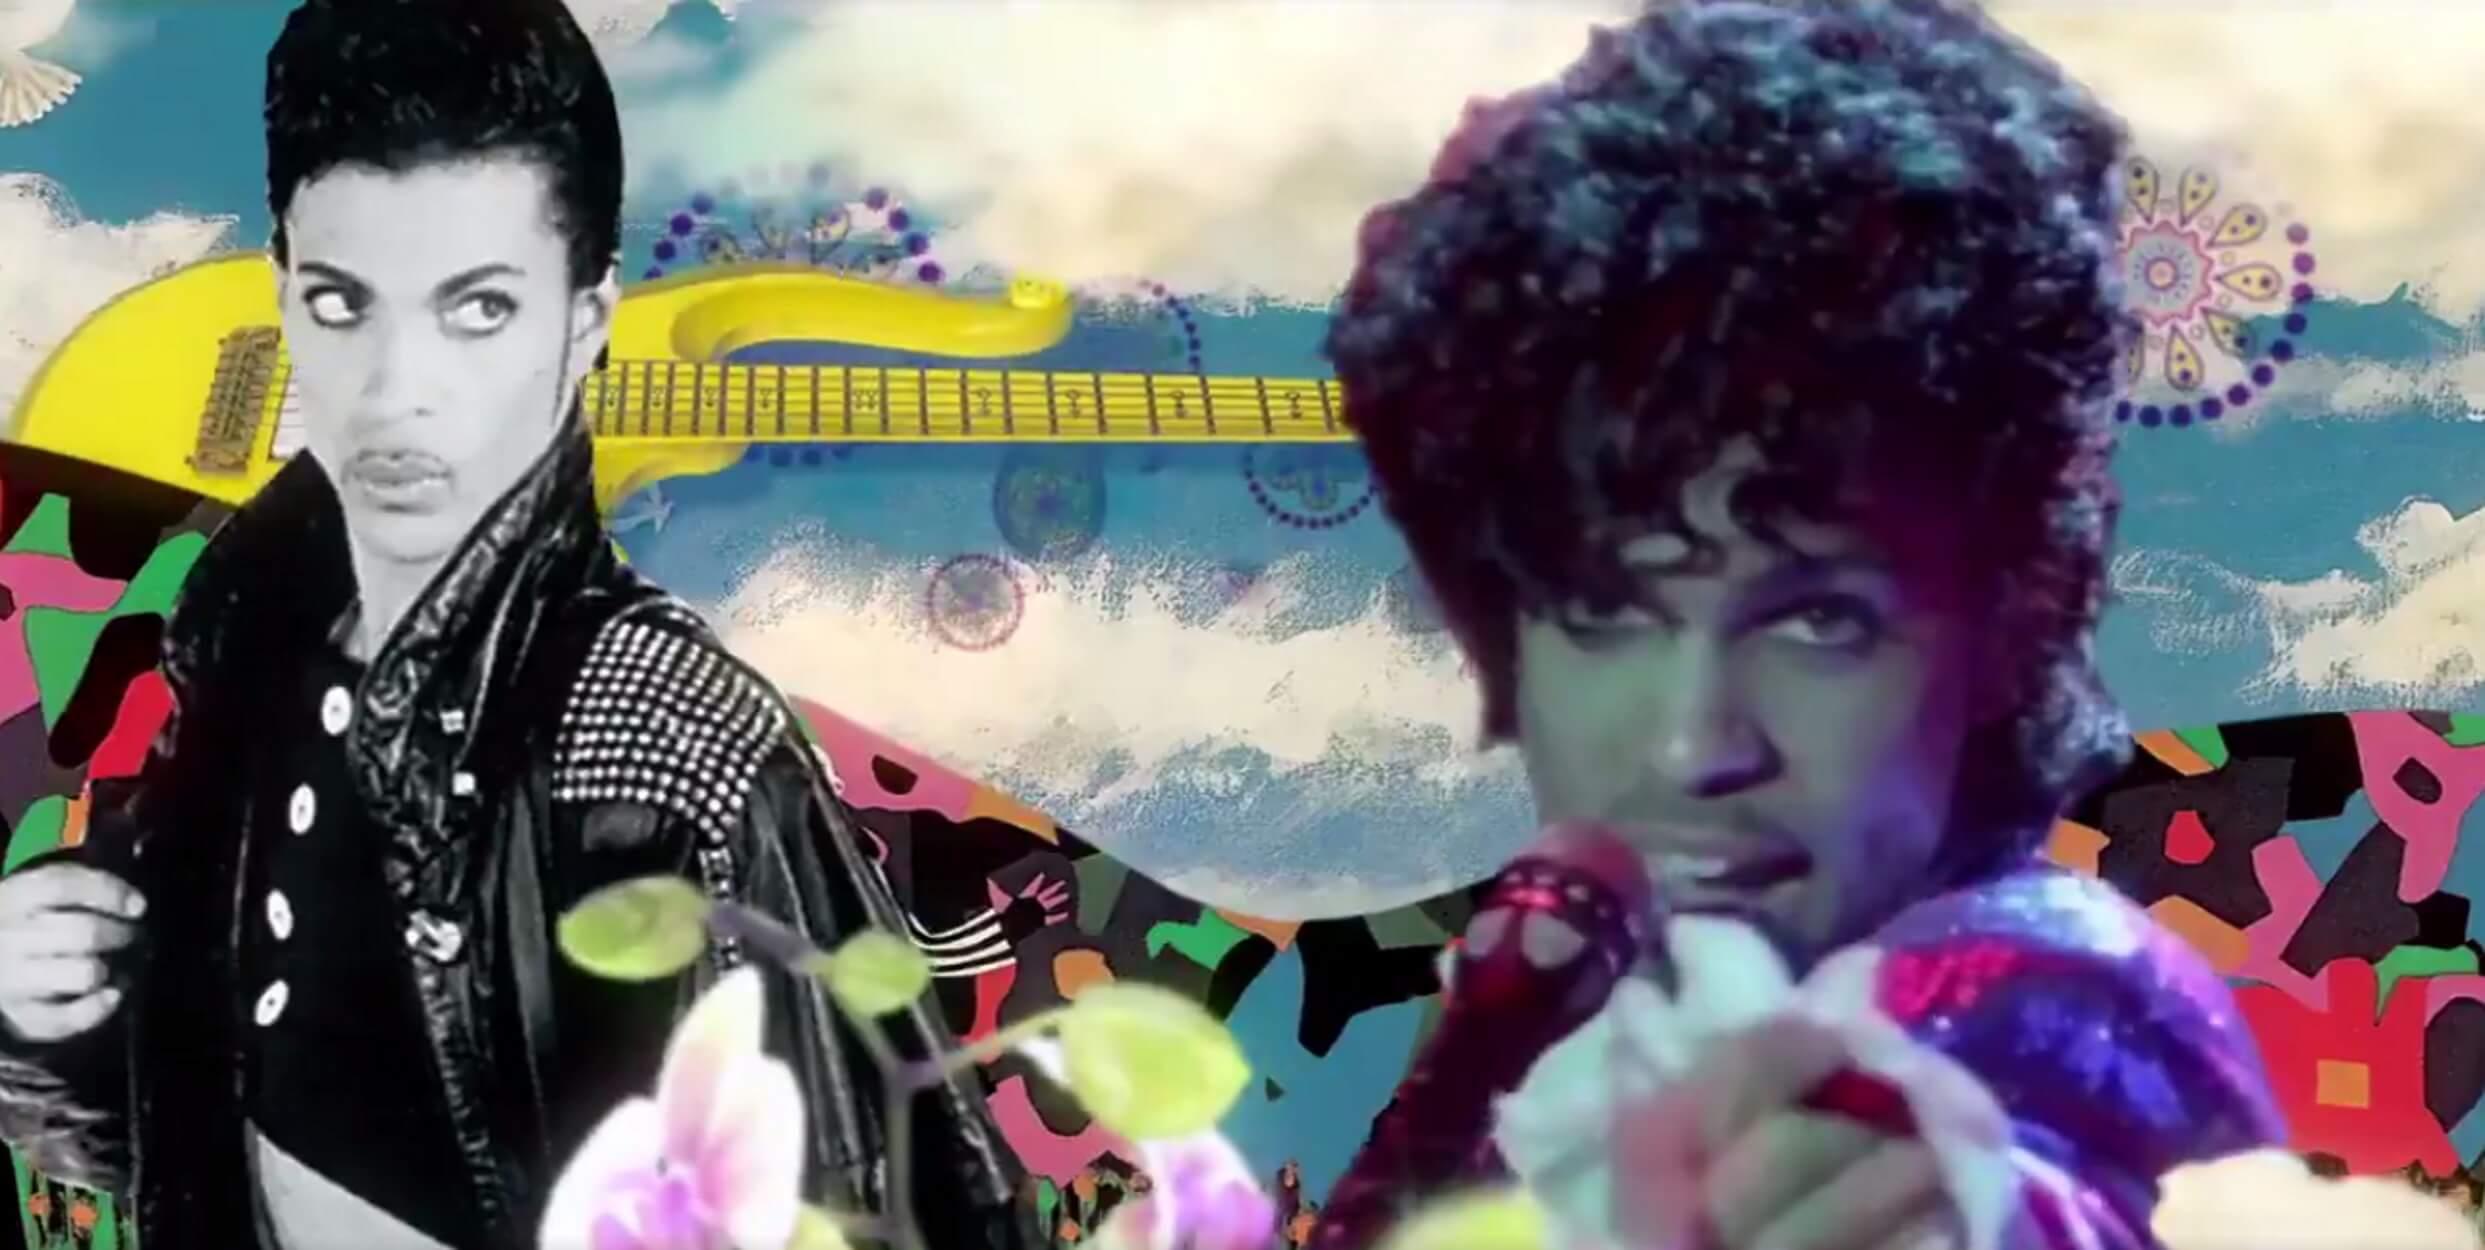 Prince: Πώς τίμησαν τη μνήμη του θρύλου της παγκόσμιας μουσικής – video